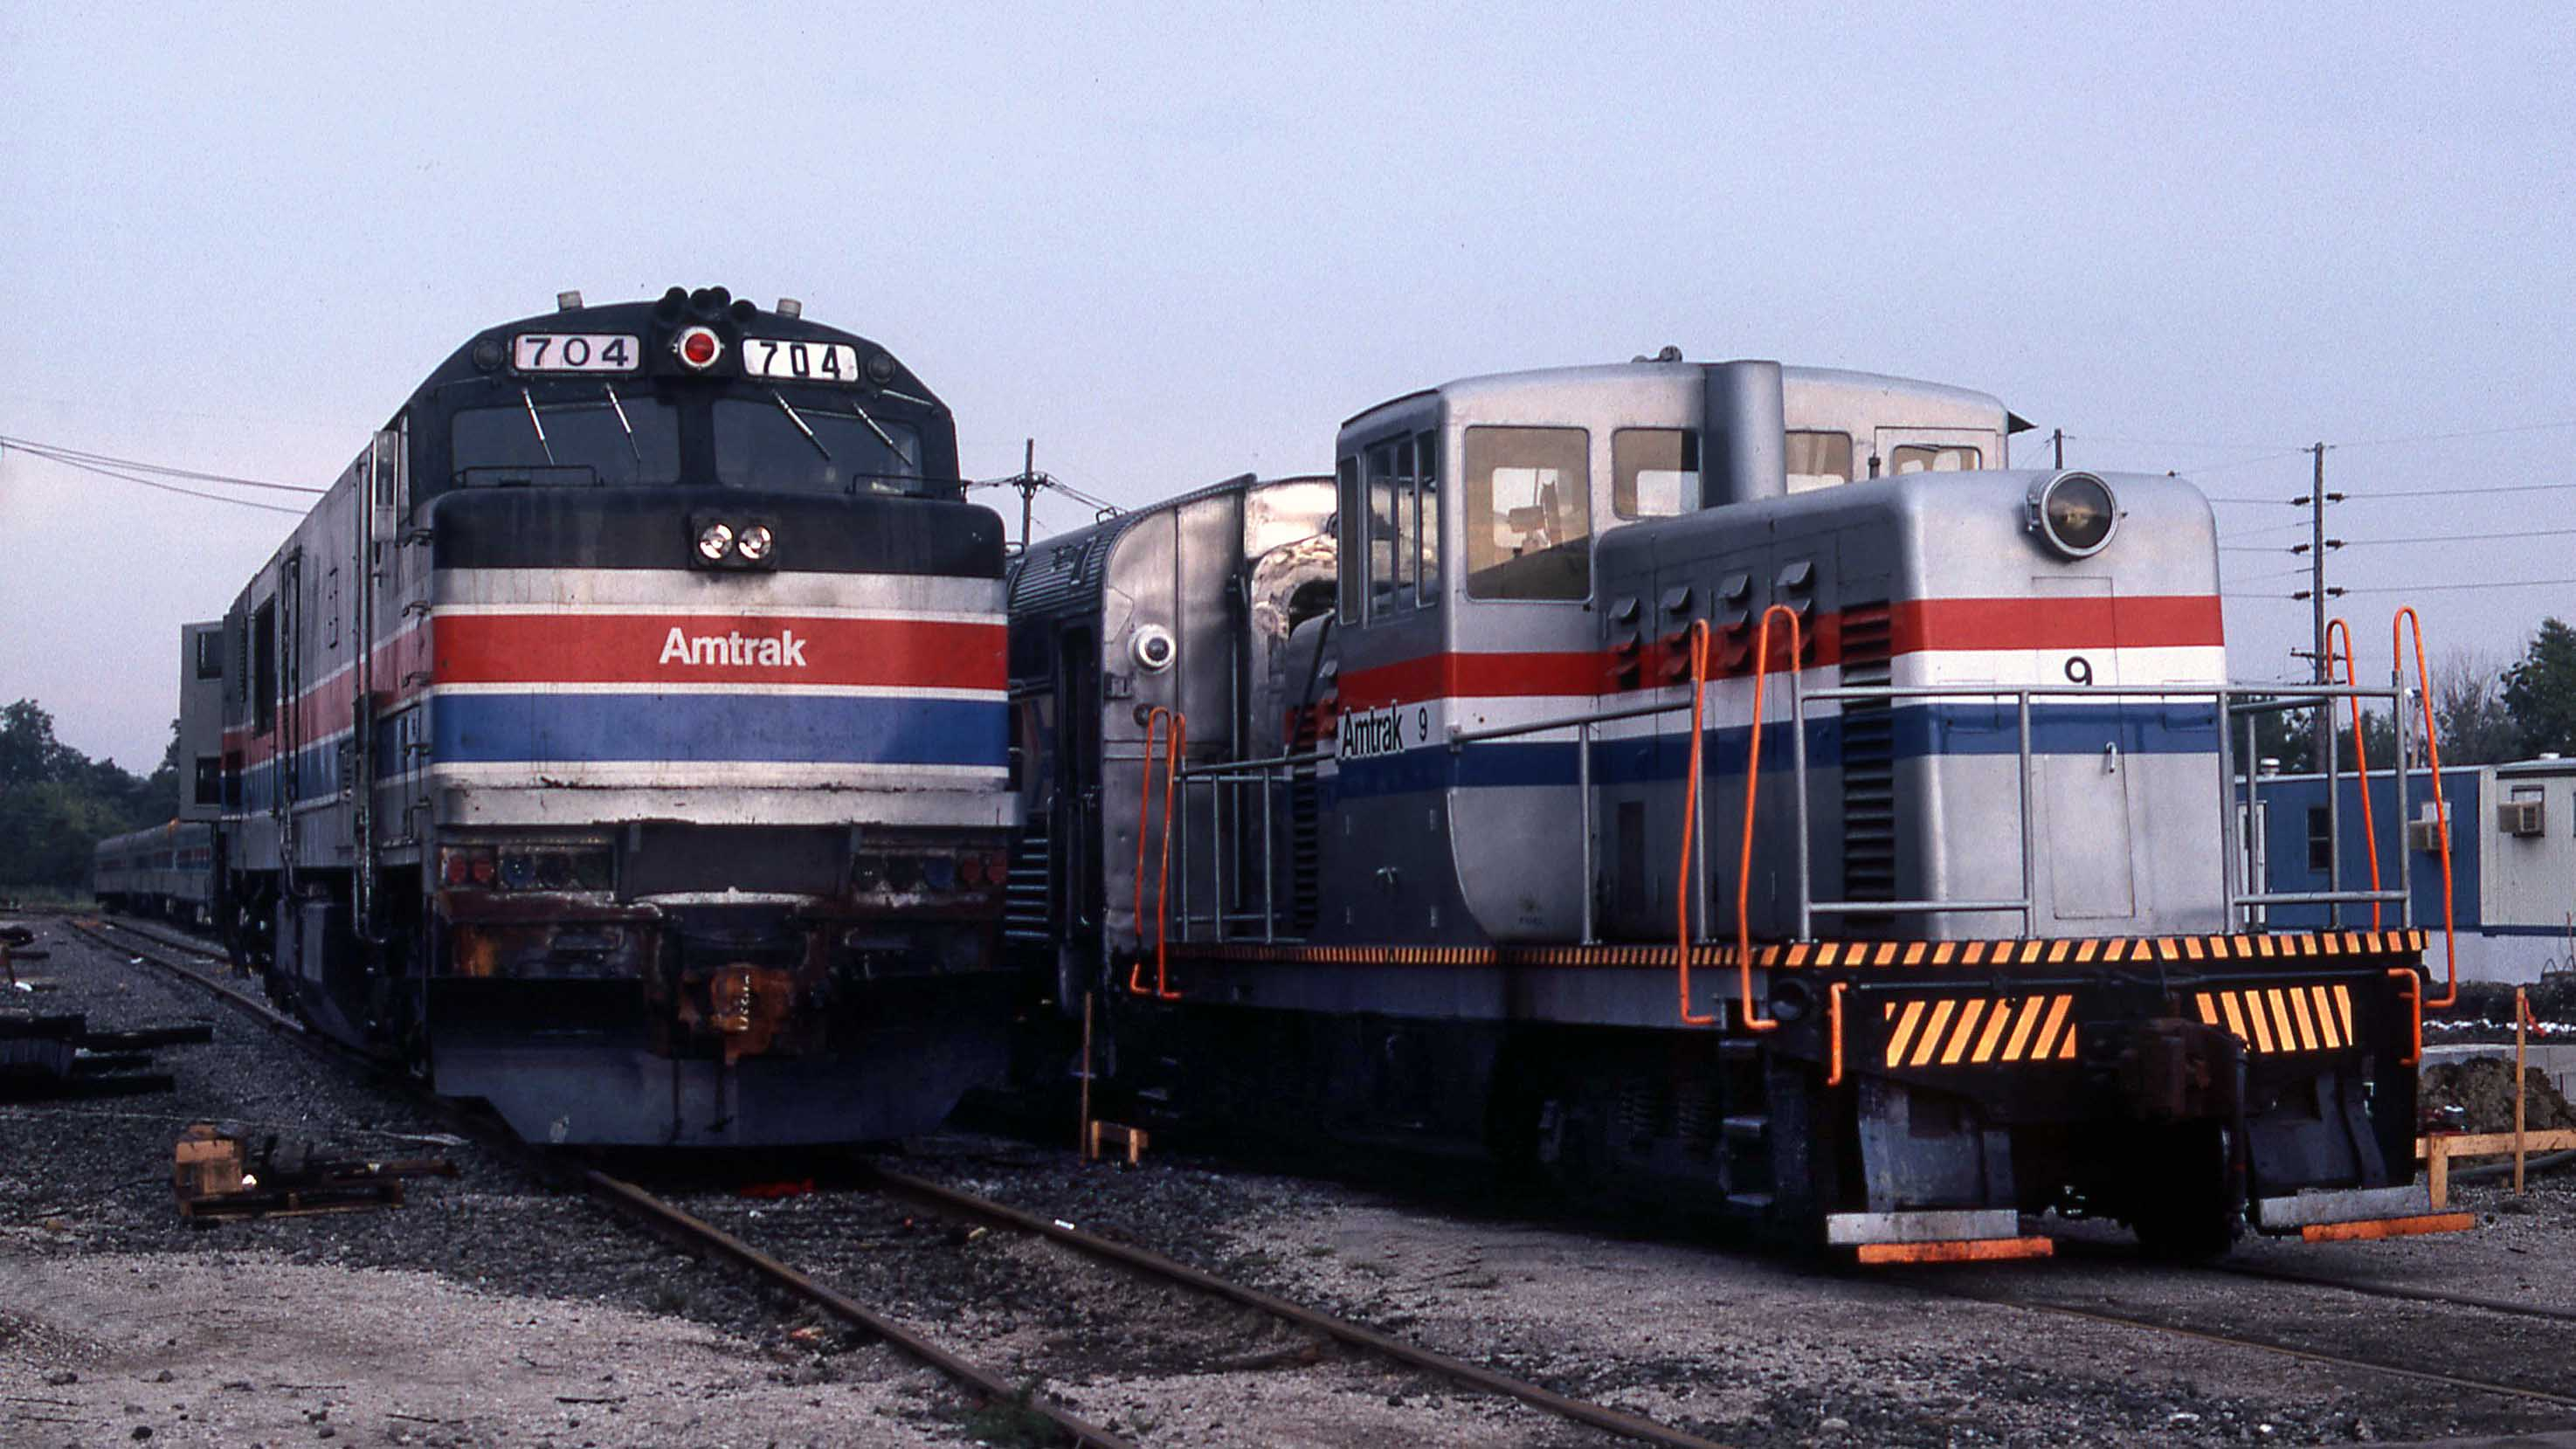 Gary-Dolzall-Amtrak-Beech-Grove